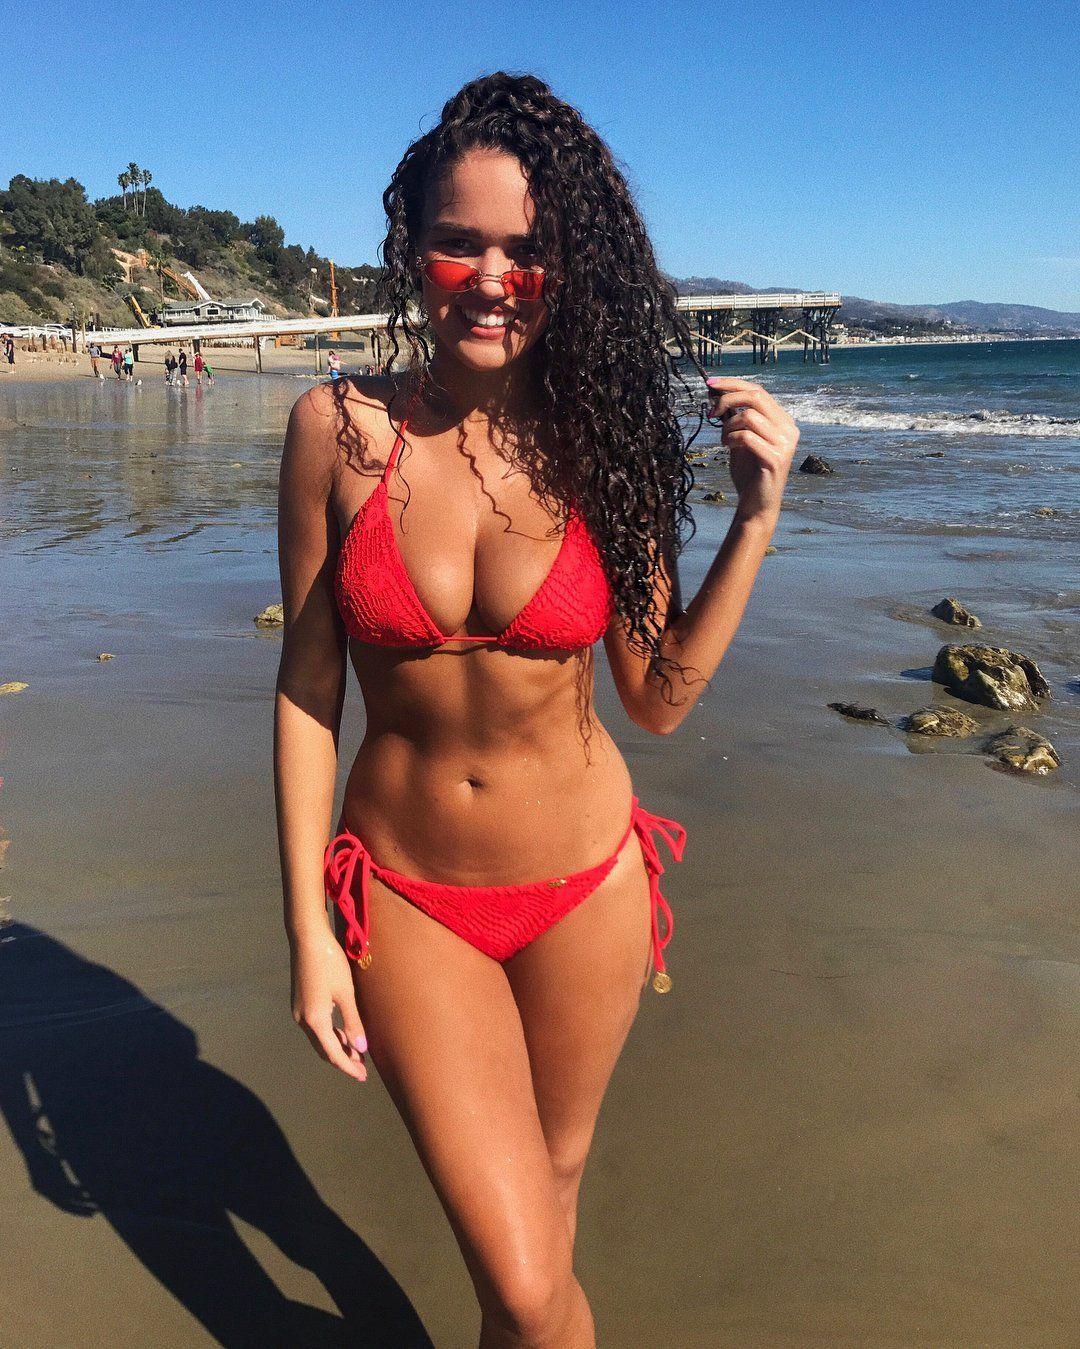 Hot Madison Pettis nude photos 2019